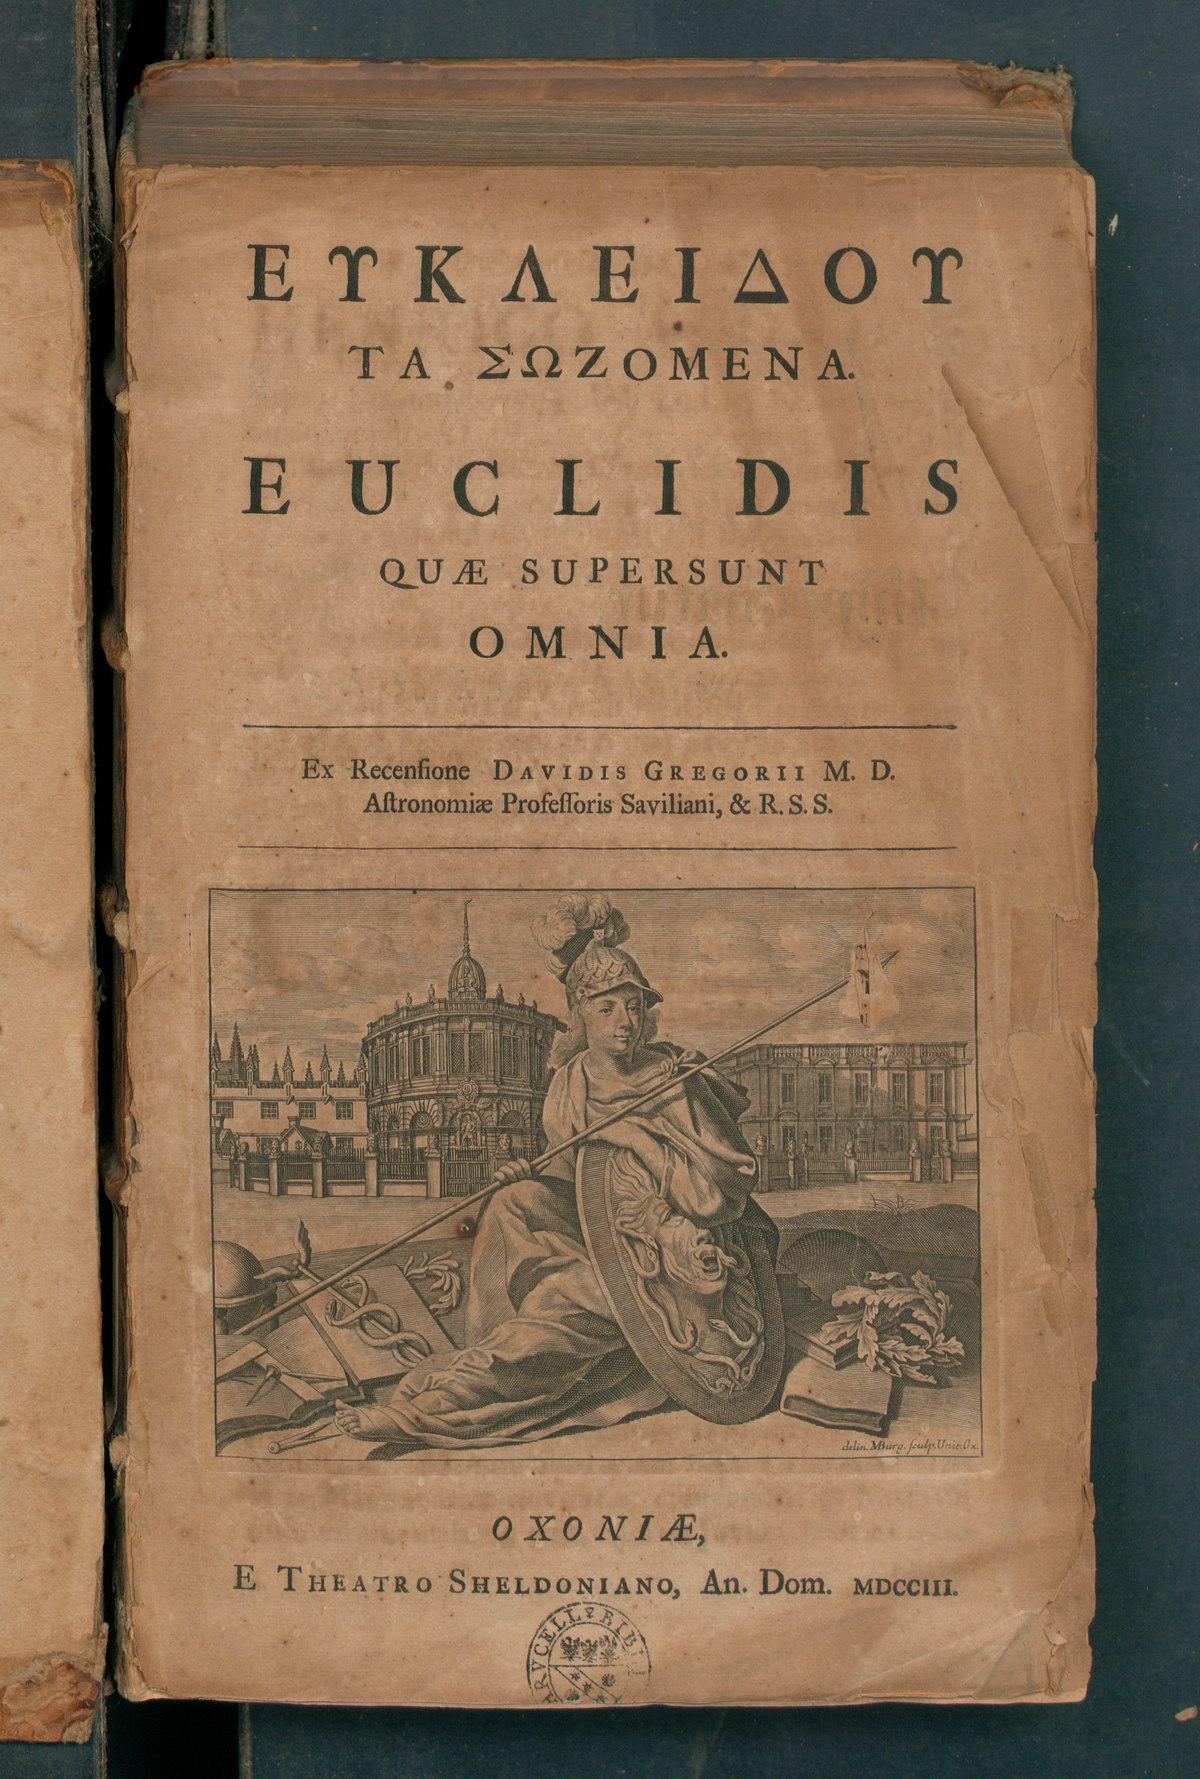 euclid wikipedia